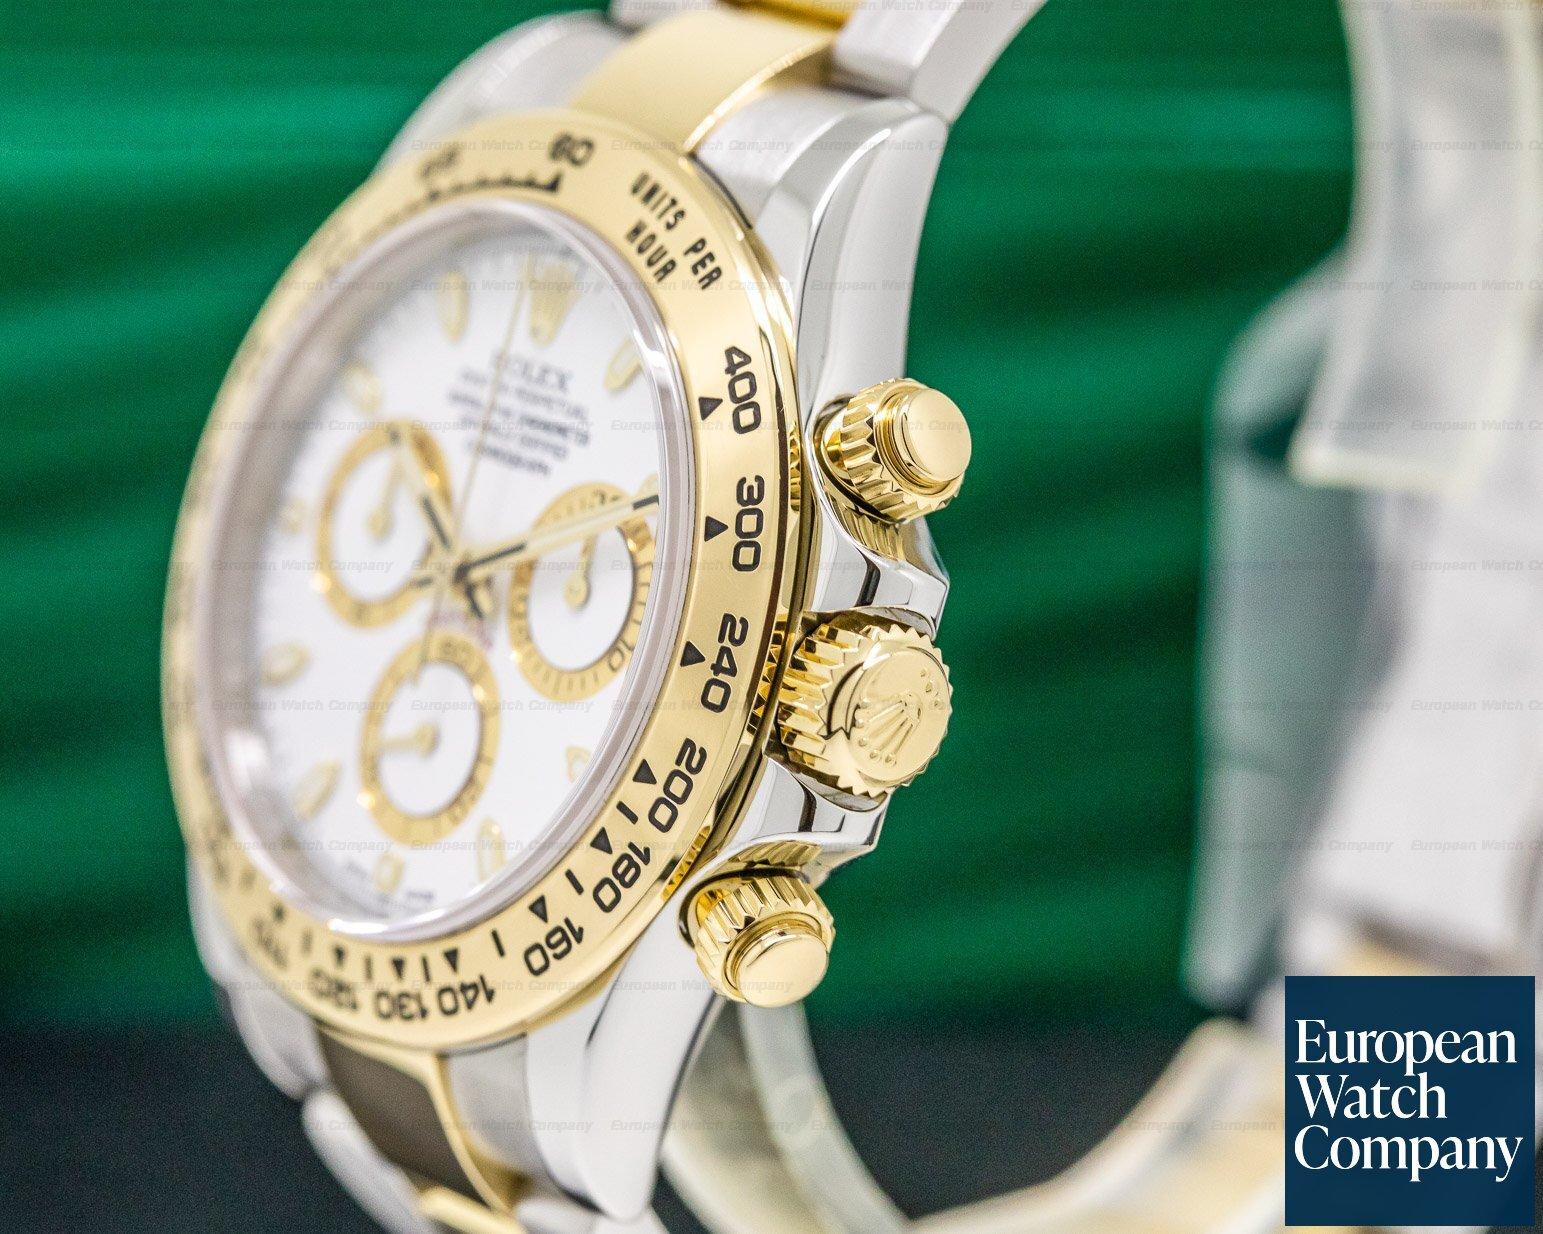 Rolex 116503 Daytona White Dial 18K / SS